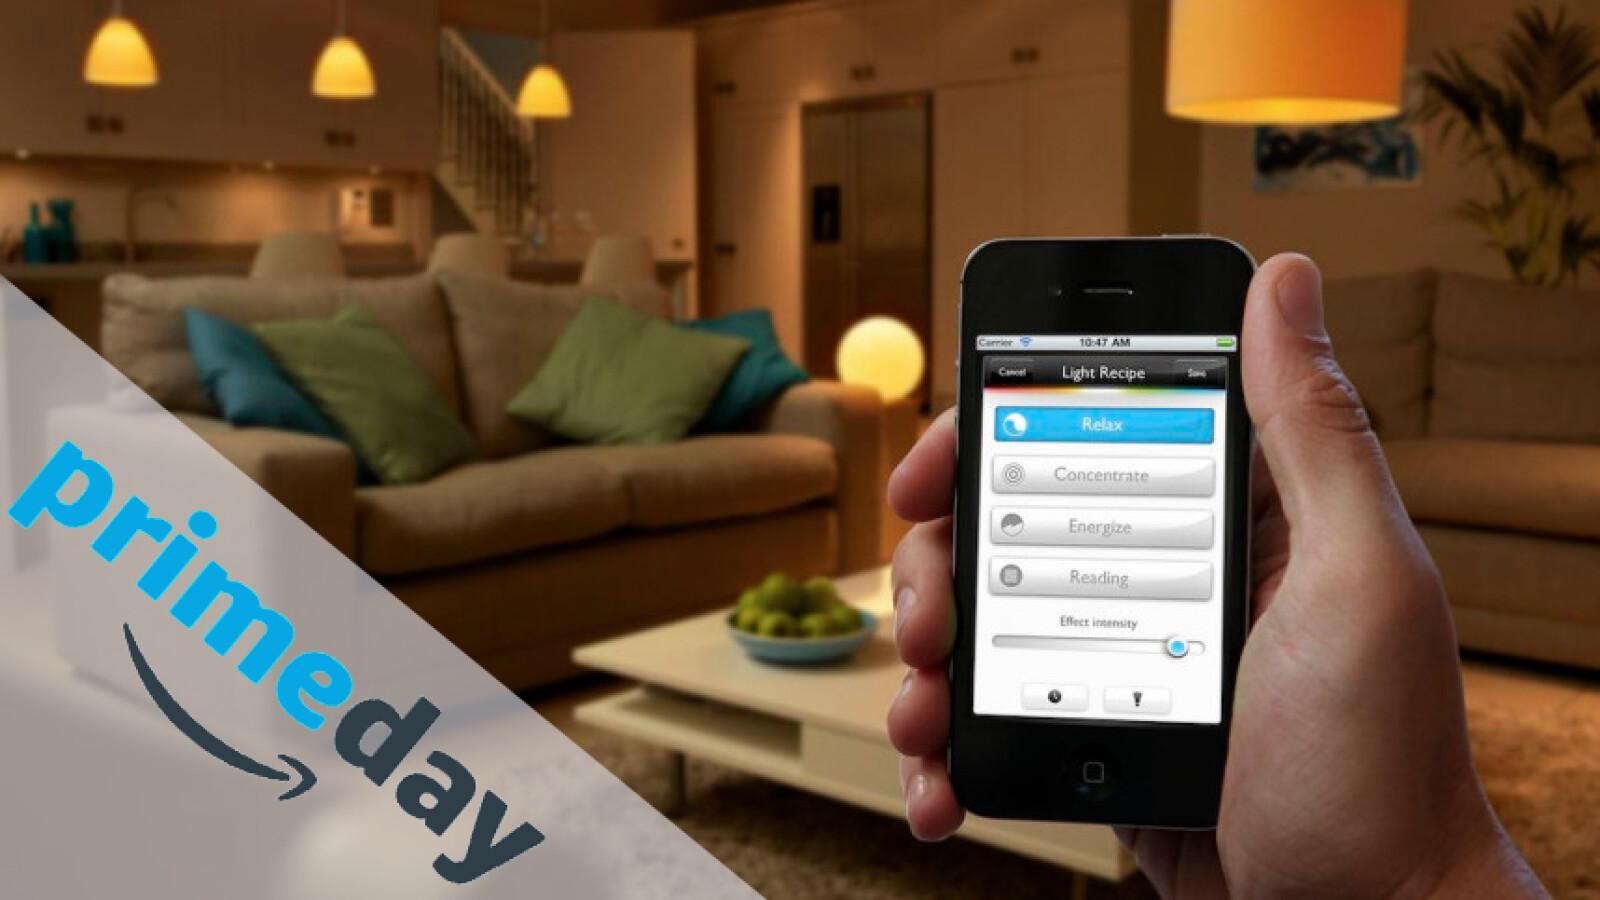 38f9108c86cb35 Philips Hue stark reduziert: Smart Home-Deals am Amazon Prime Day - NETZWELT